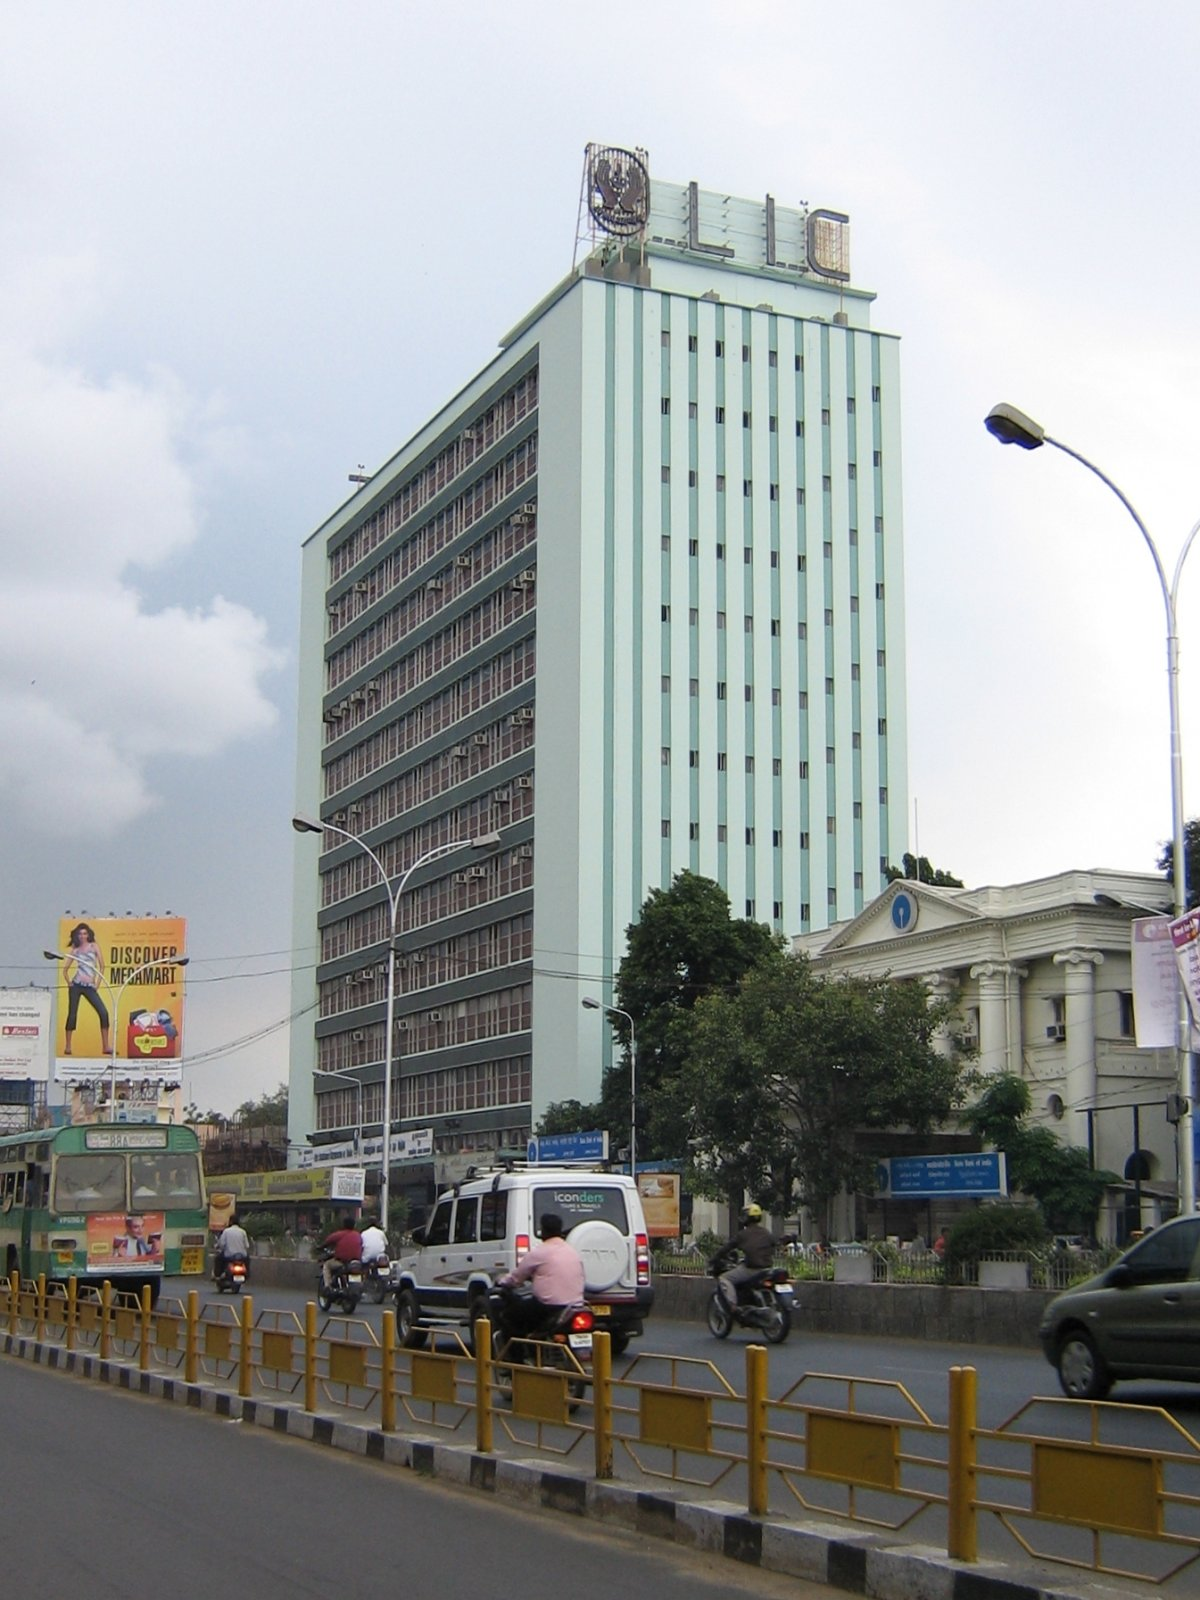 http://upload.wikimedia.org/wikipedia/commons/1/1e/LIC_building,_Chennai.jpg